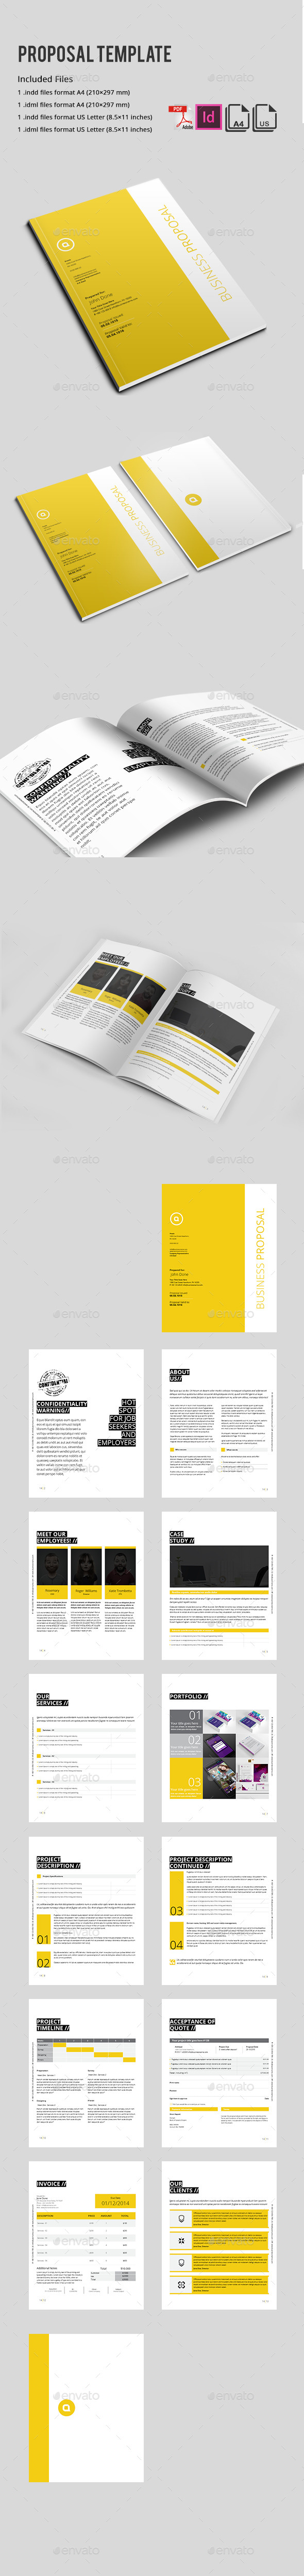 GraphicRiver Proposal Template 9666148